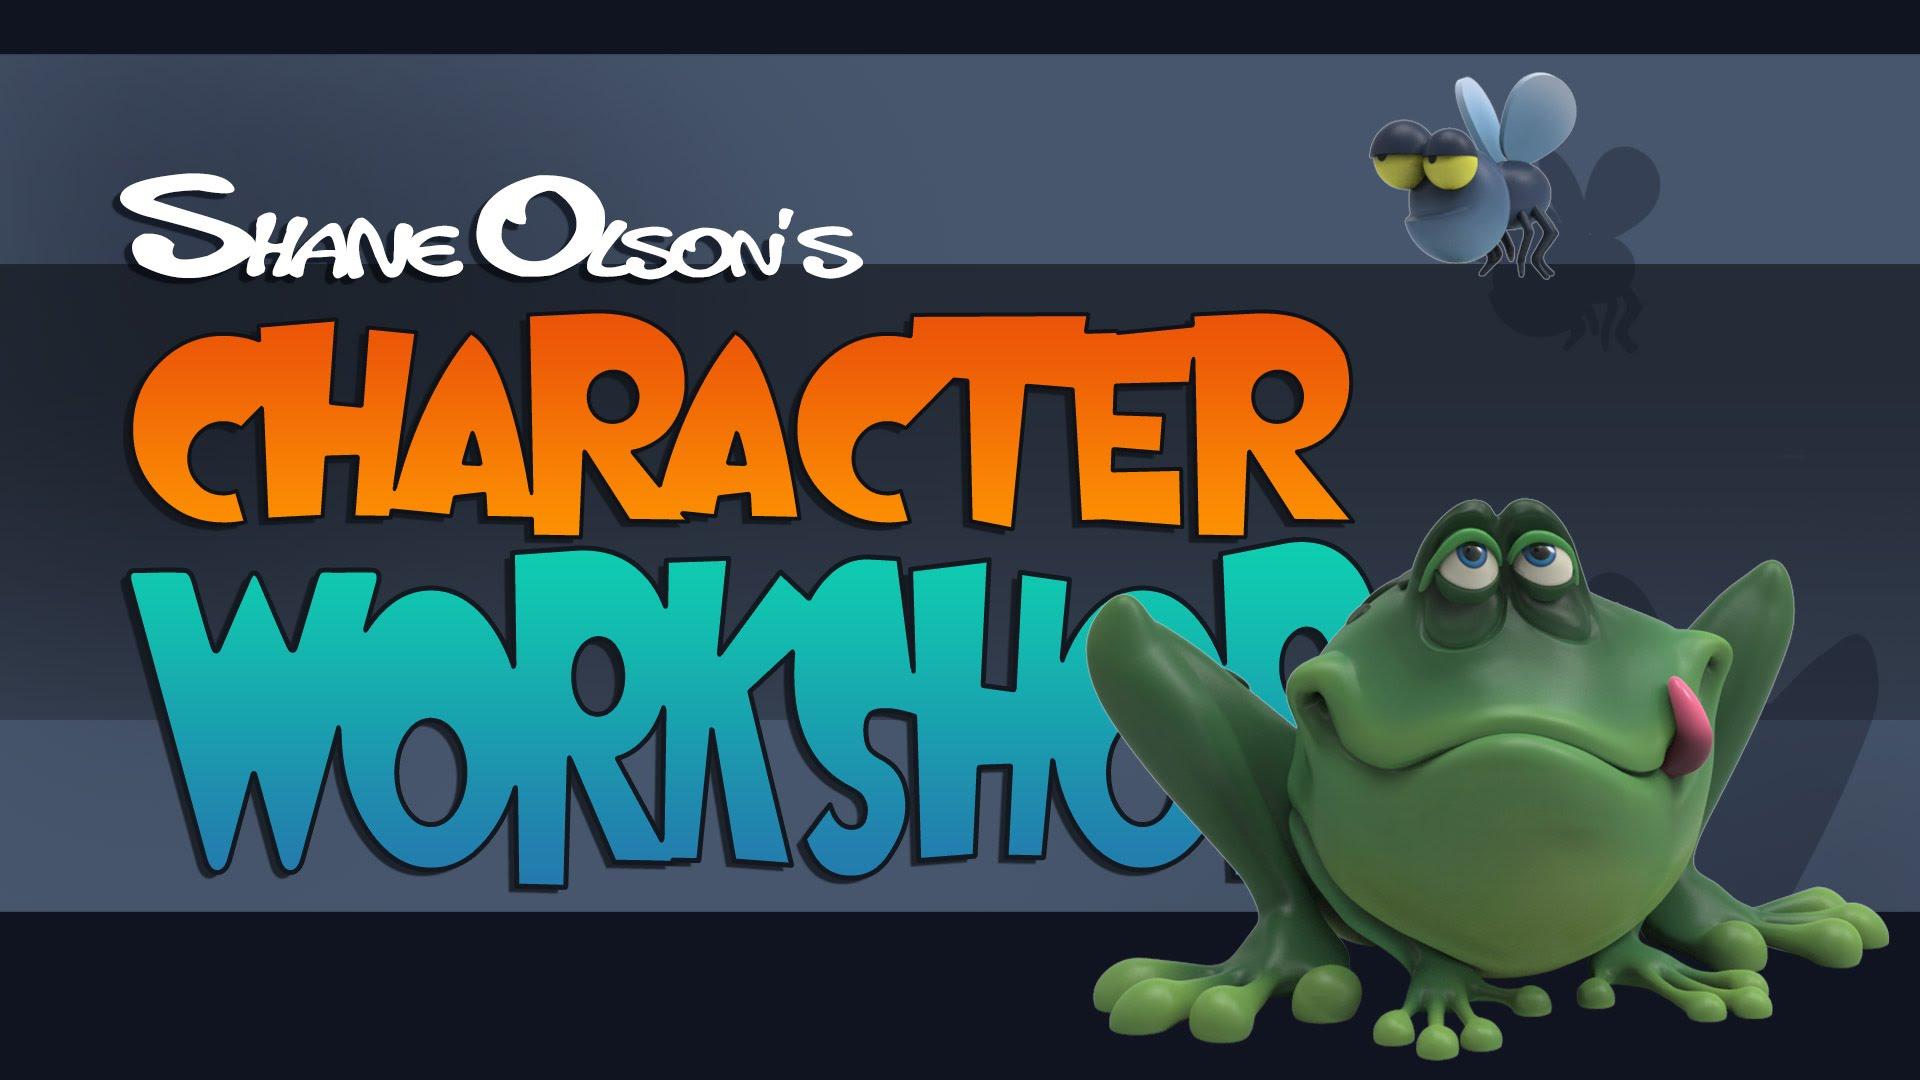 Shane Olson  Beginner Zbrush Training Creating a Simple Cartoon Character  Thinking Animation